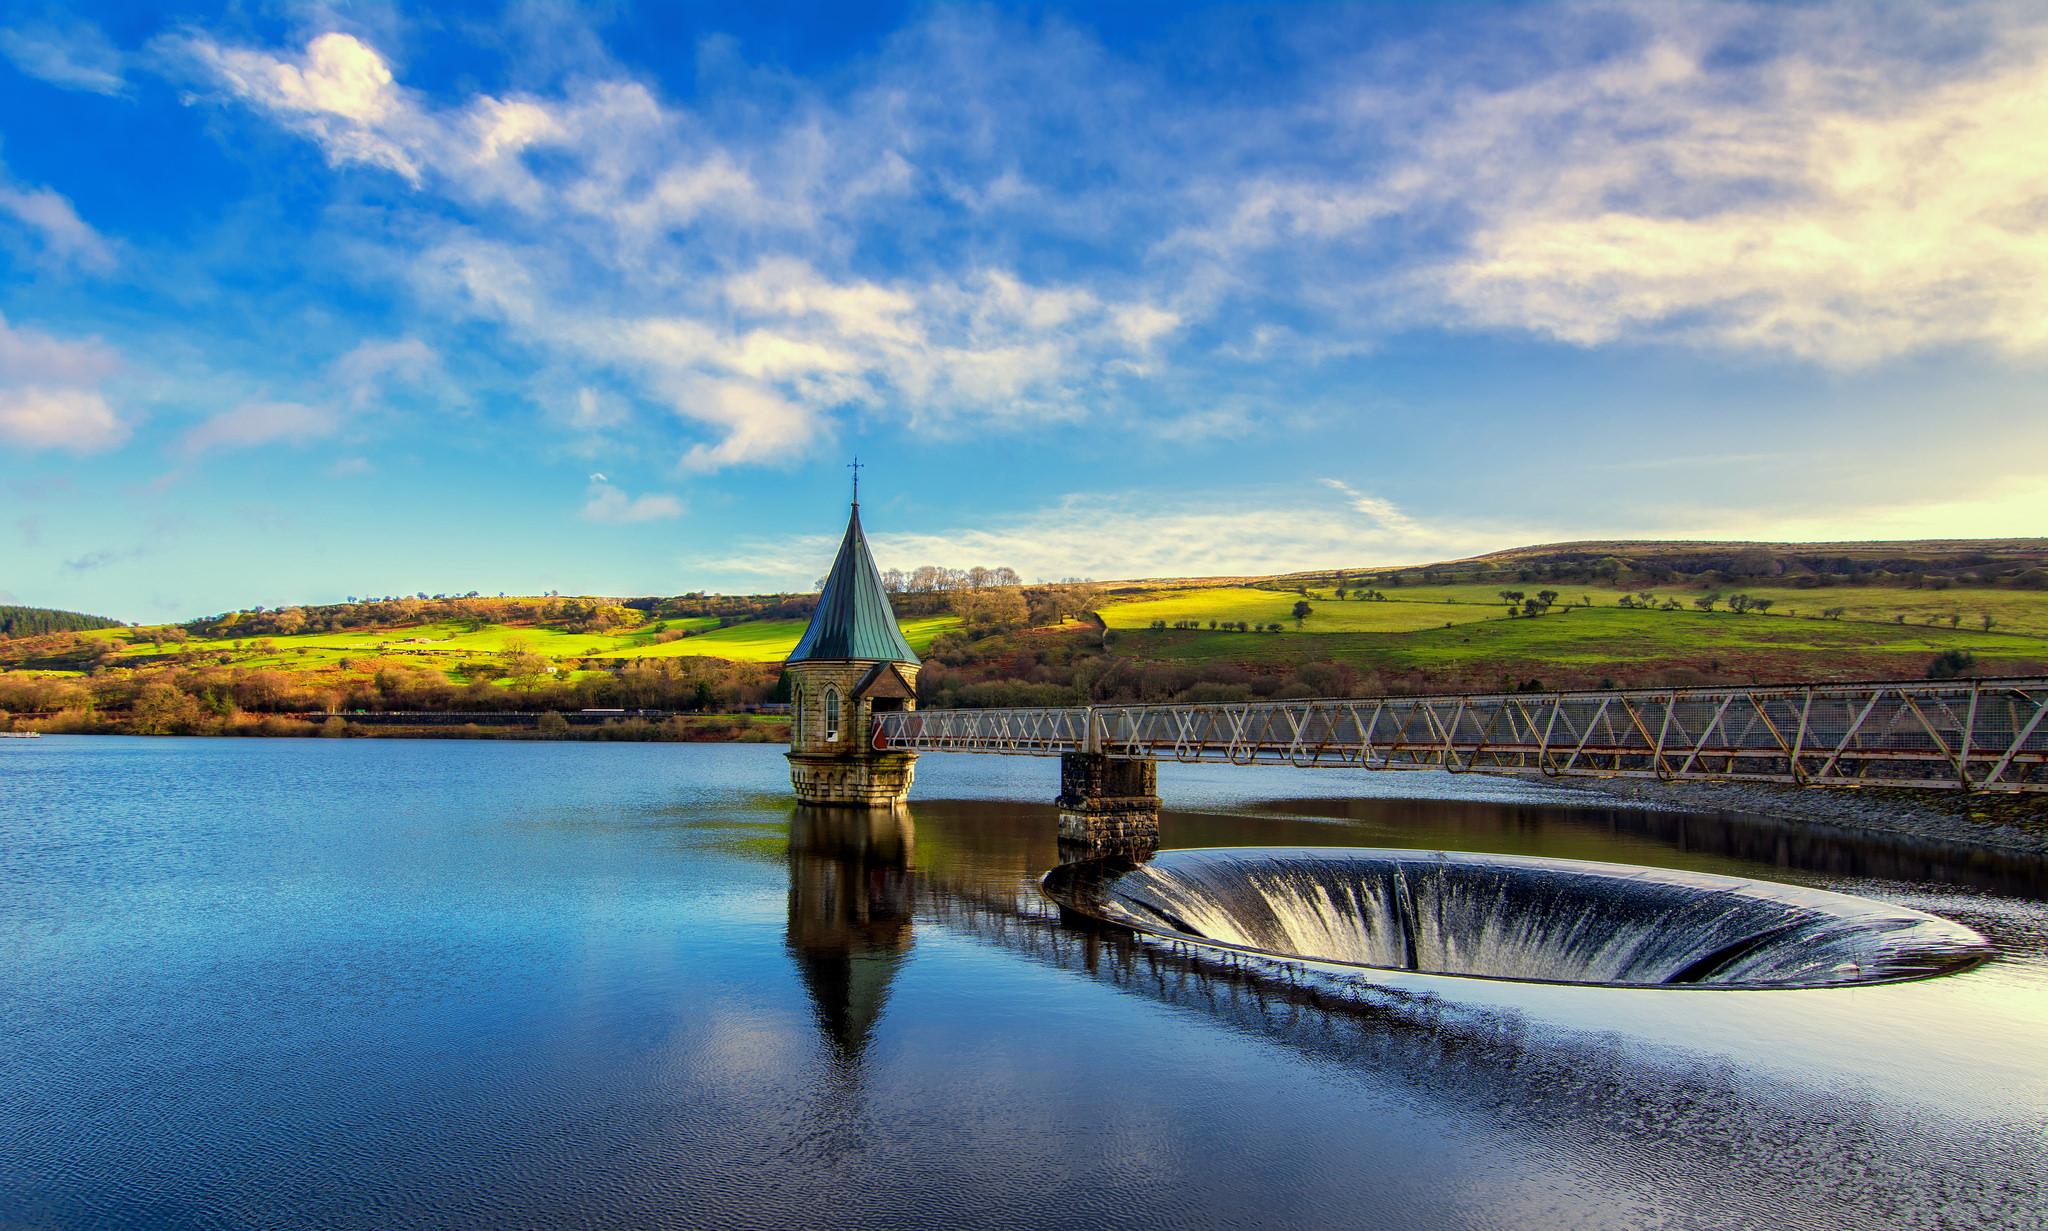 Уэльс, Великобритания, Брекон маяки